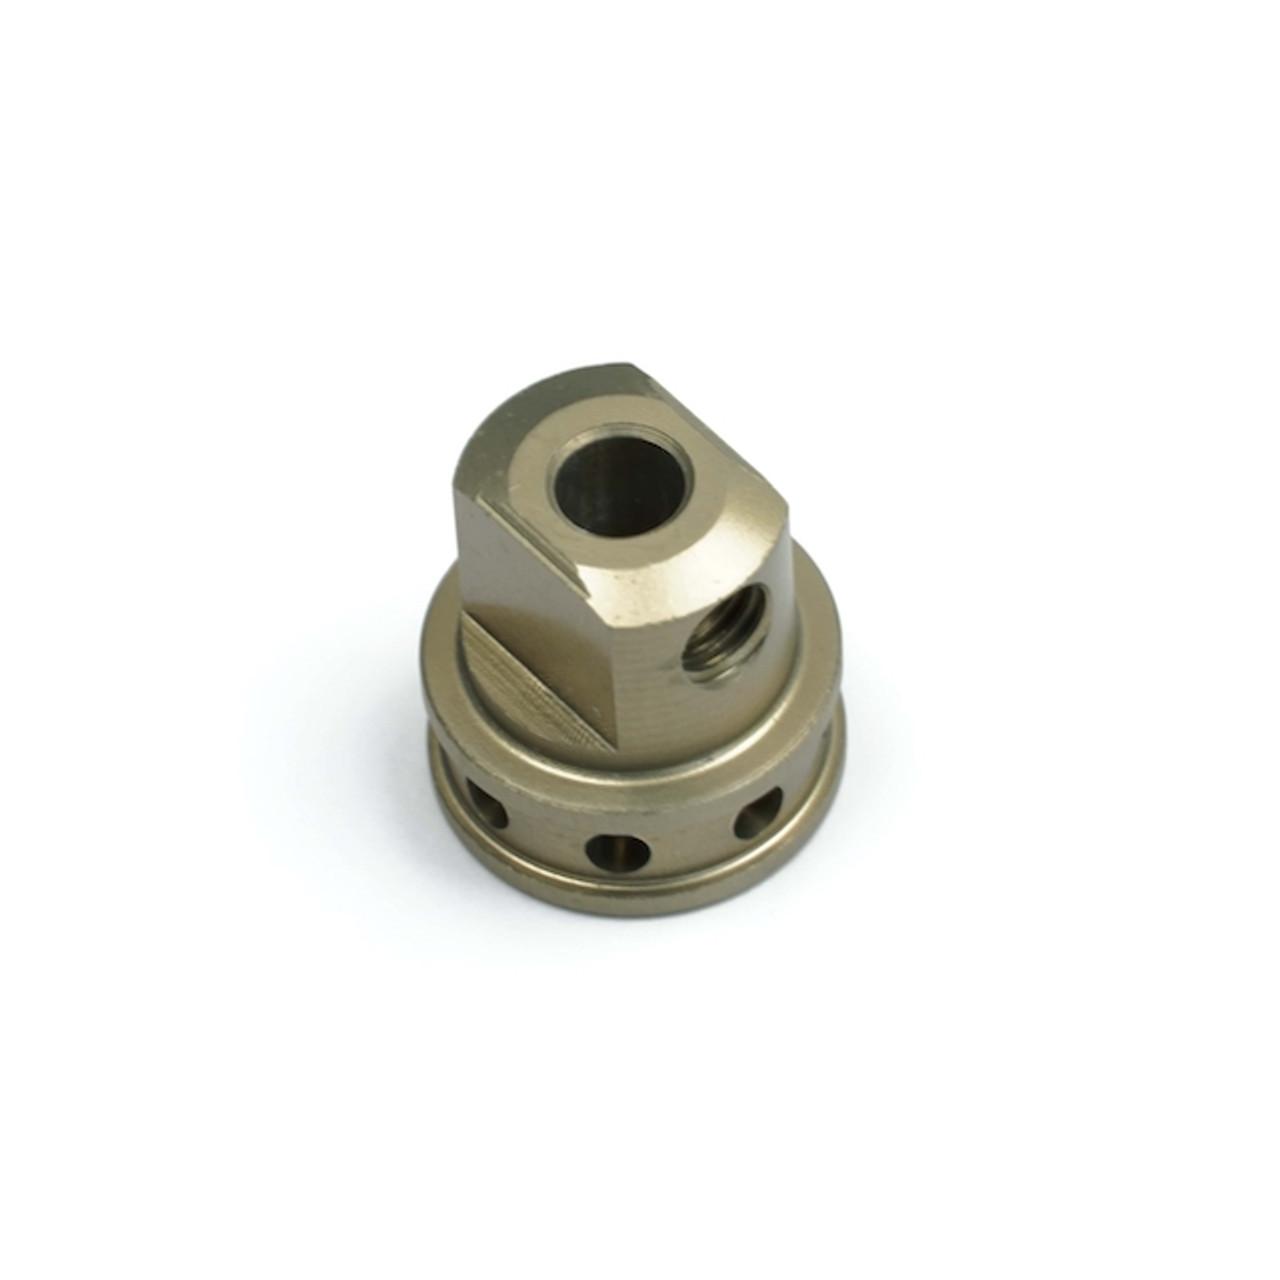 Option - Drive Shaft - Centre Joint Cup - Aluminium